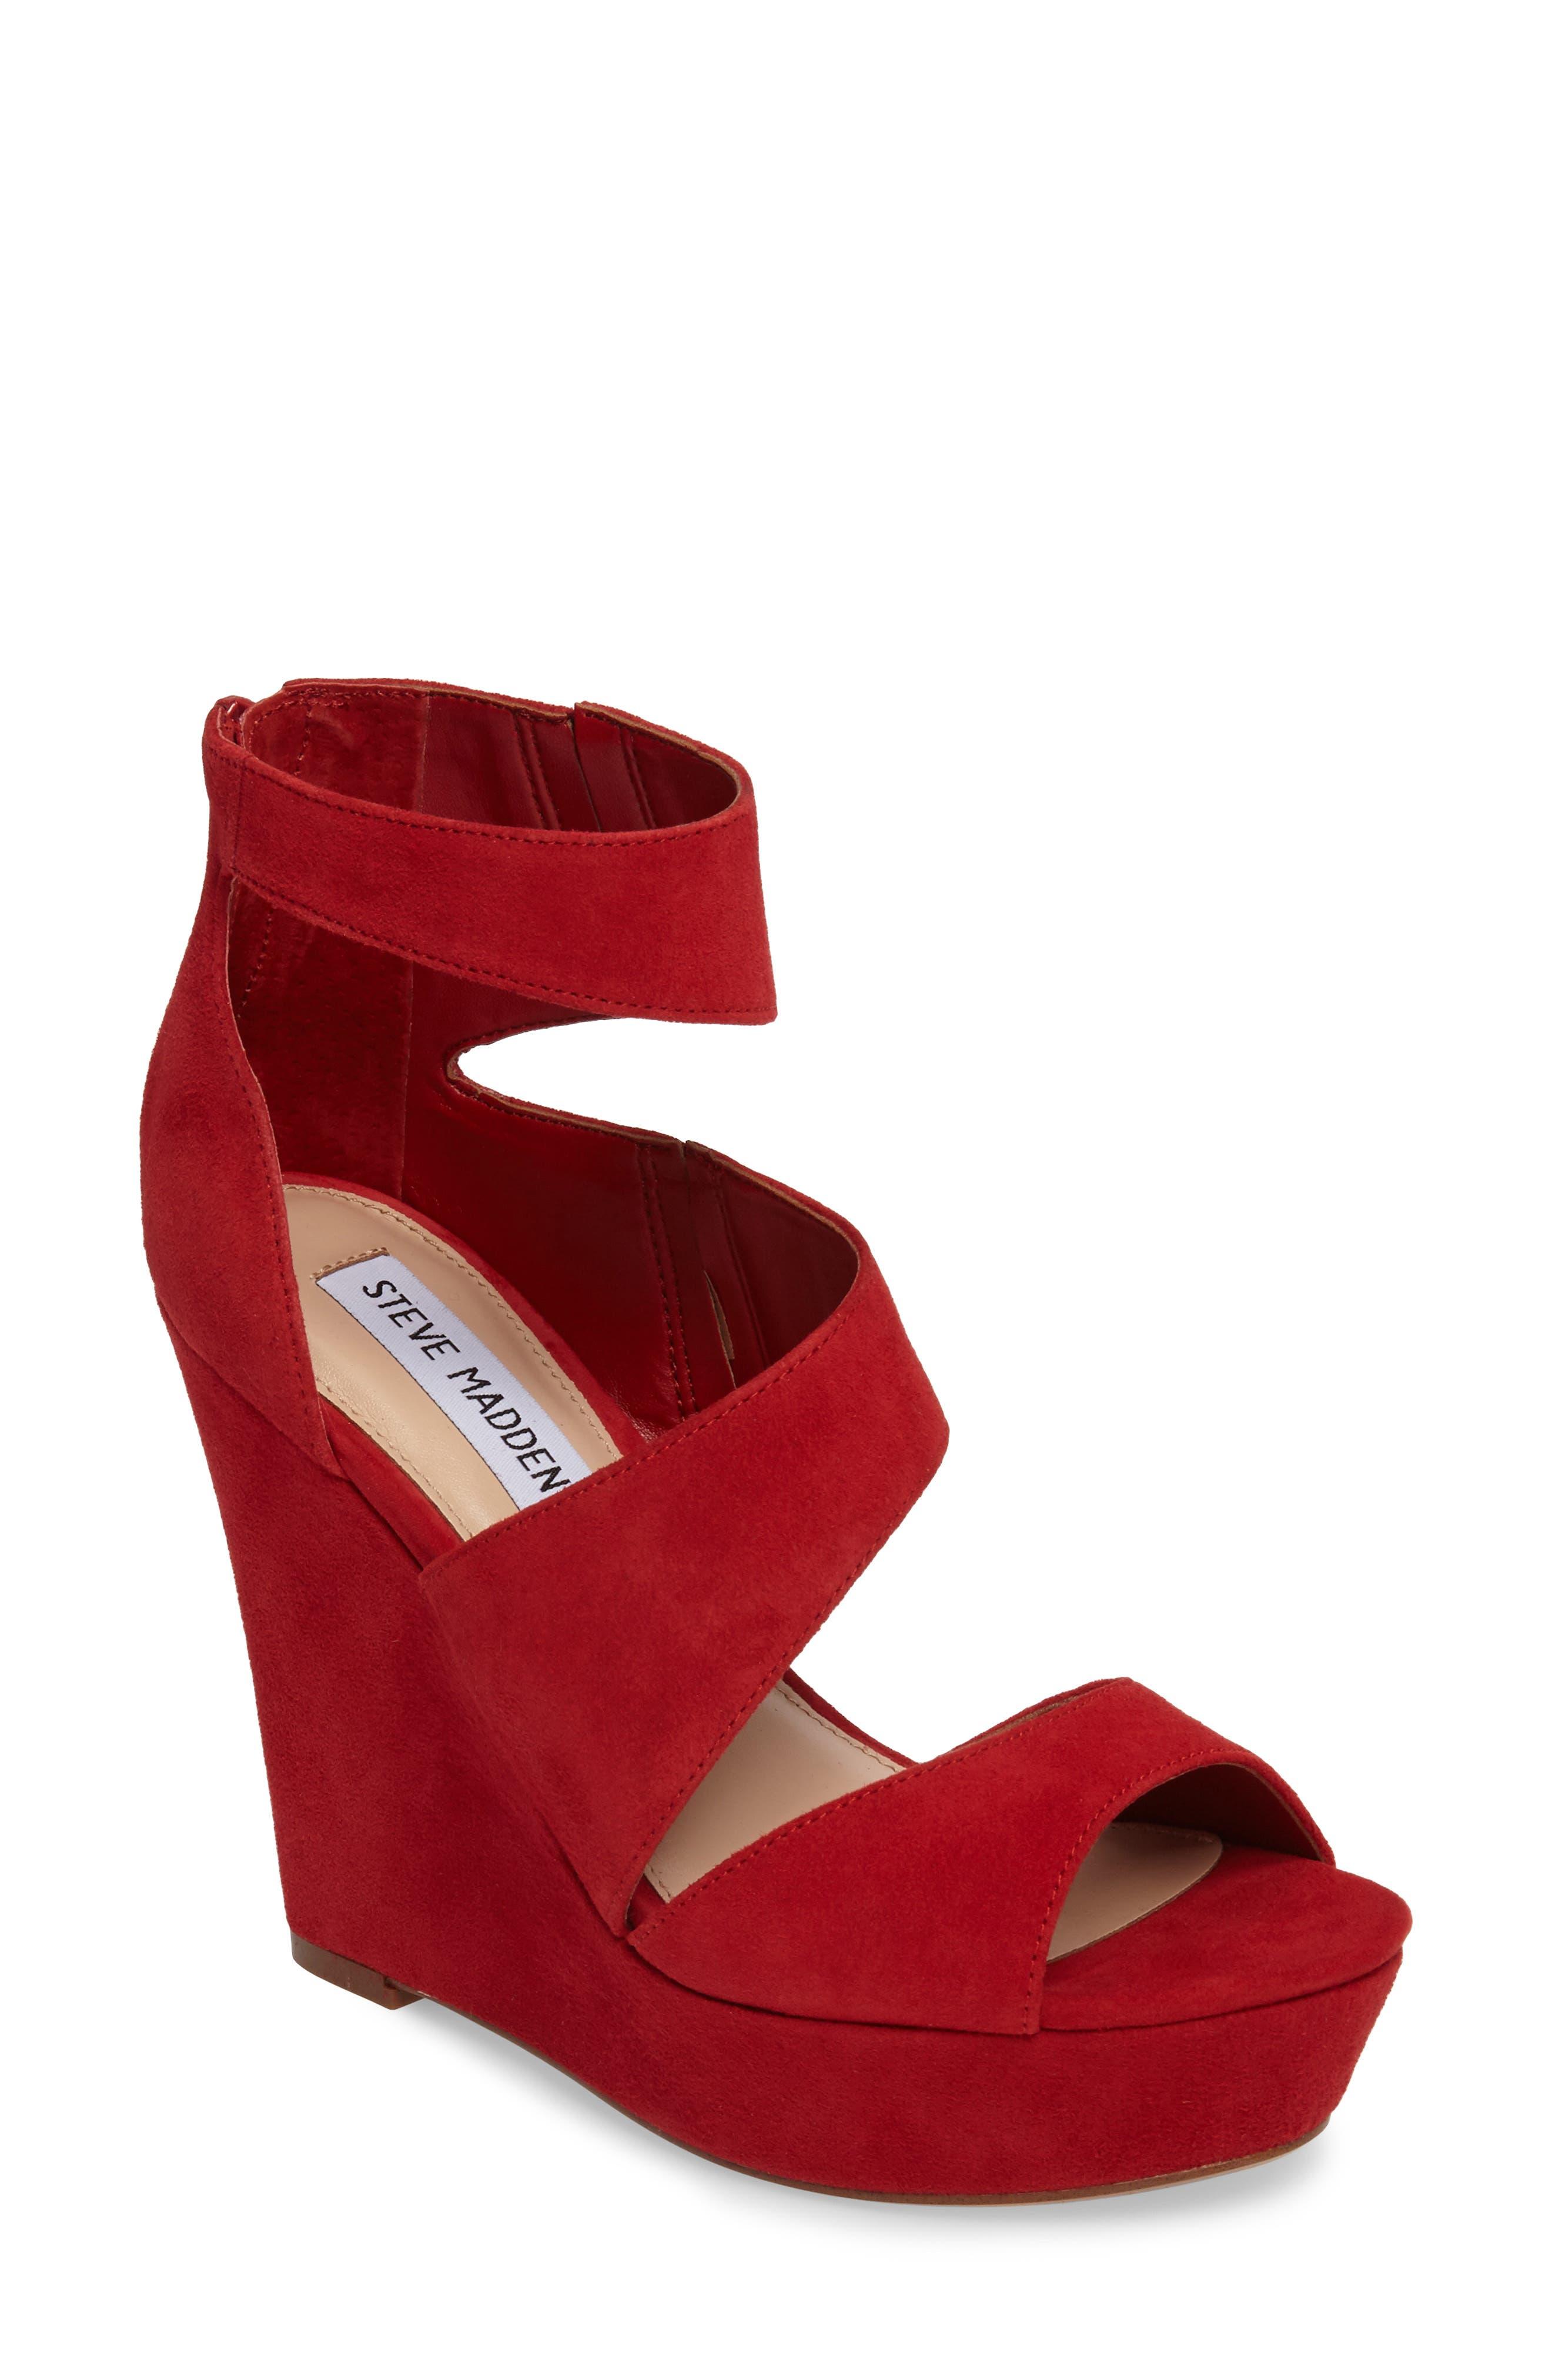 Main Image - Steve Madden Essey Asymmetrical Platform Wedge Sandal (Women)